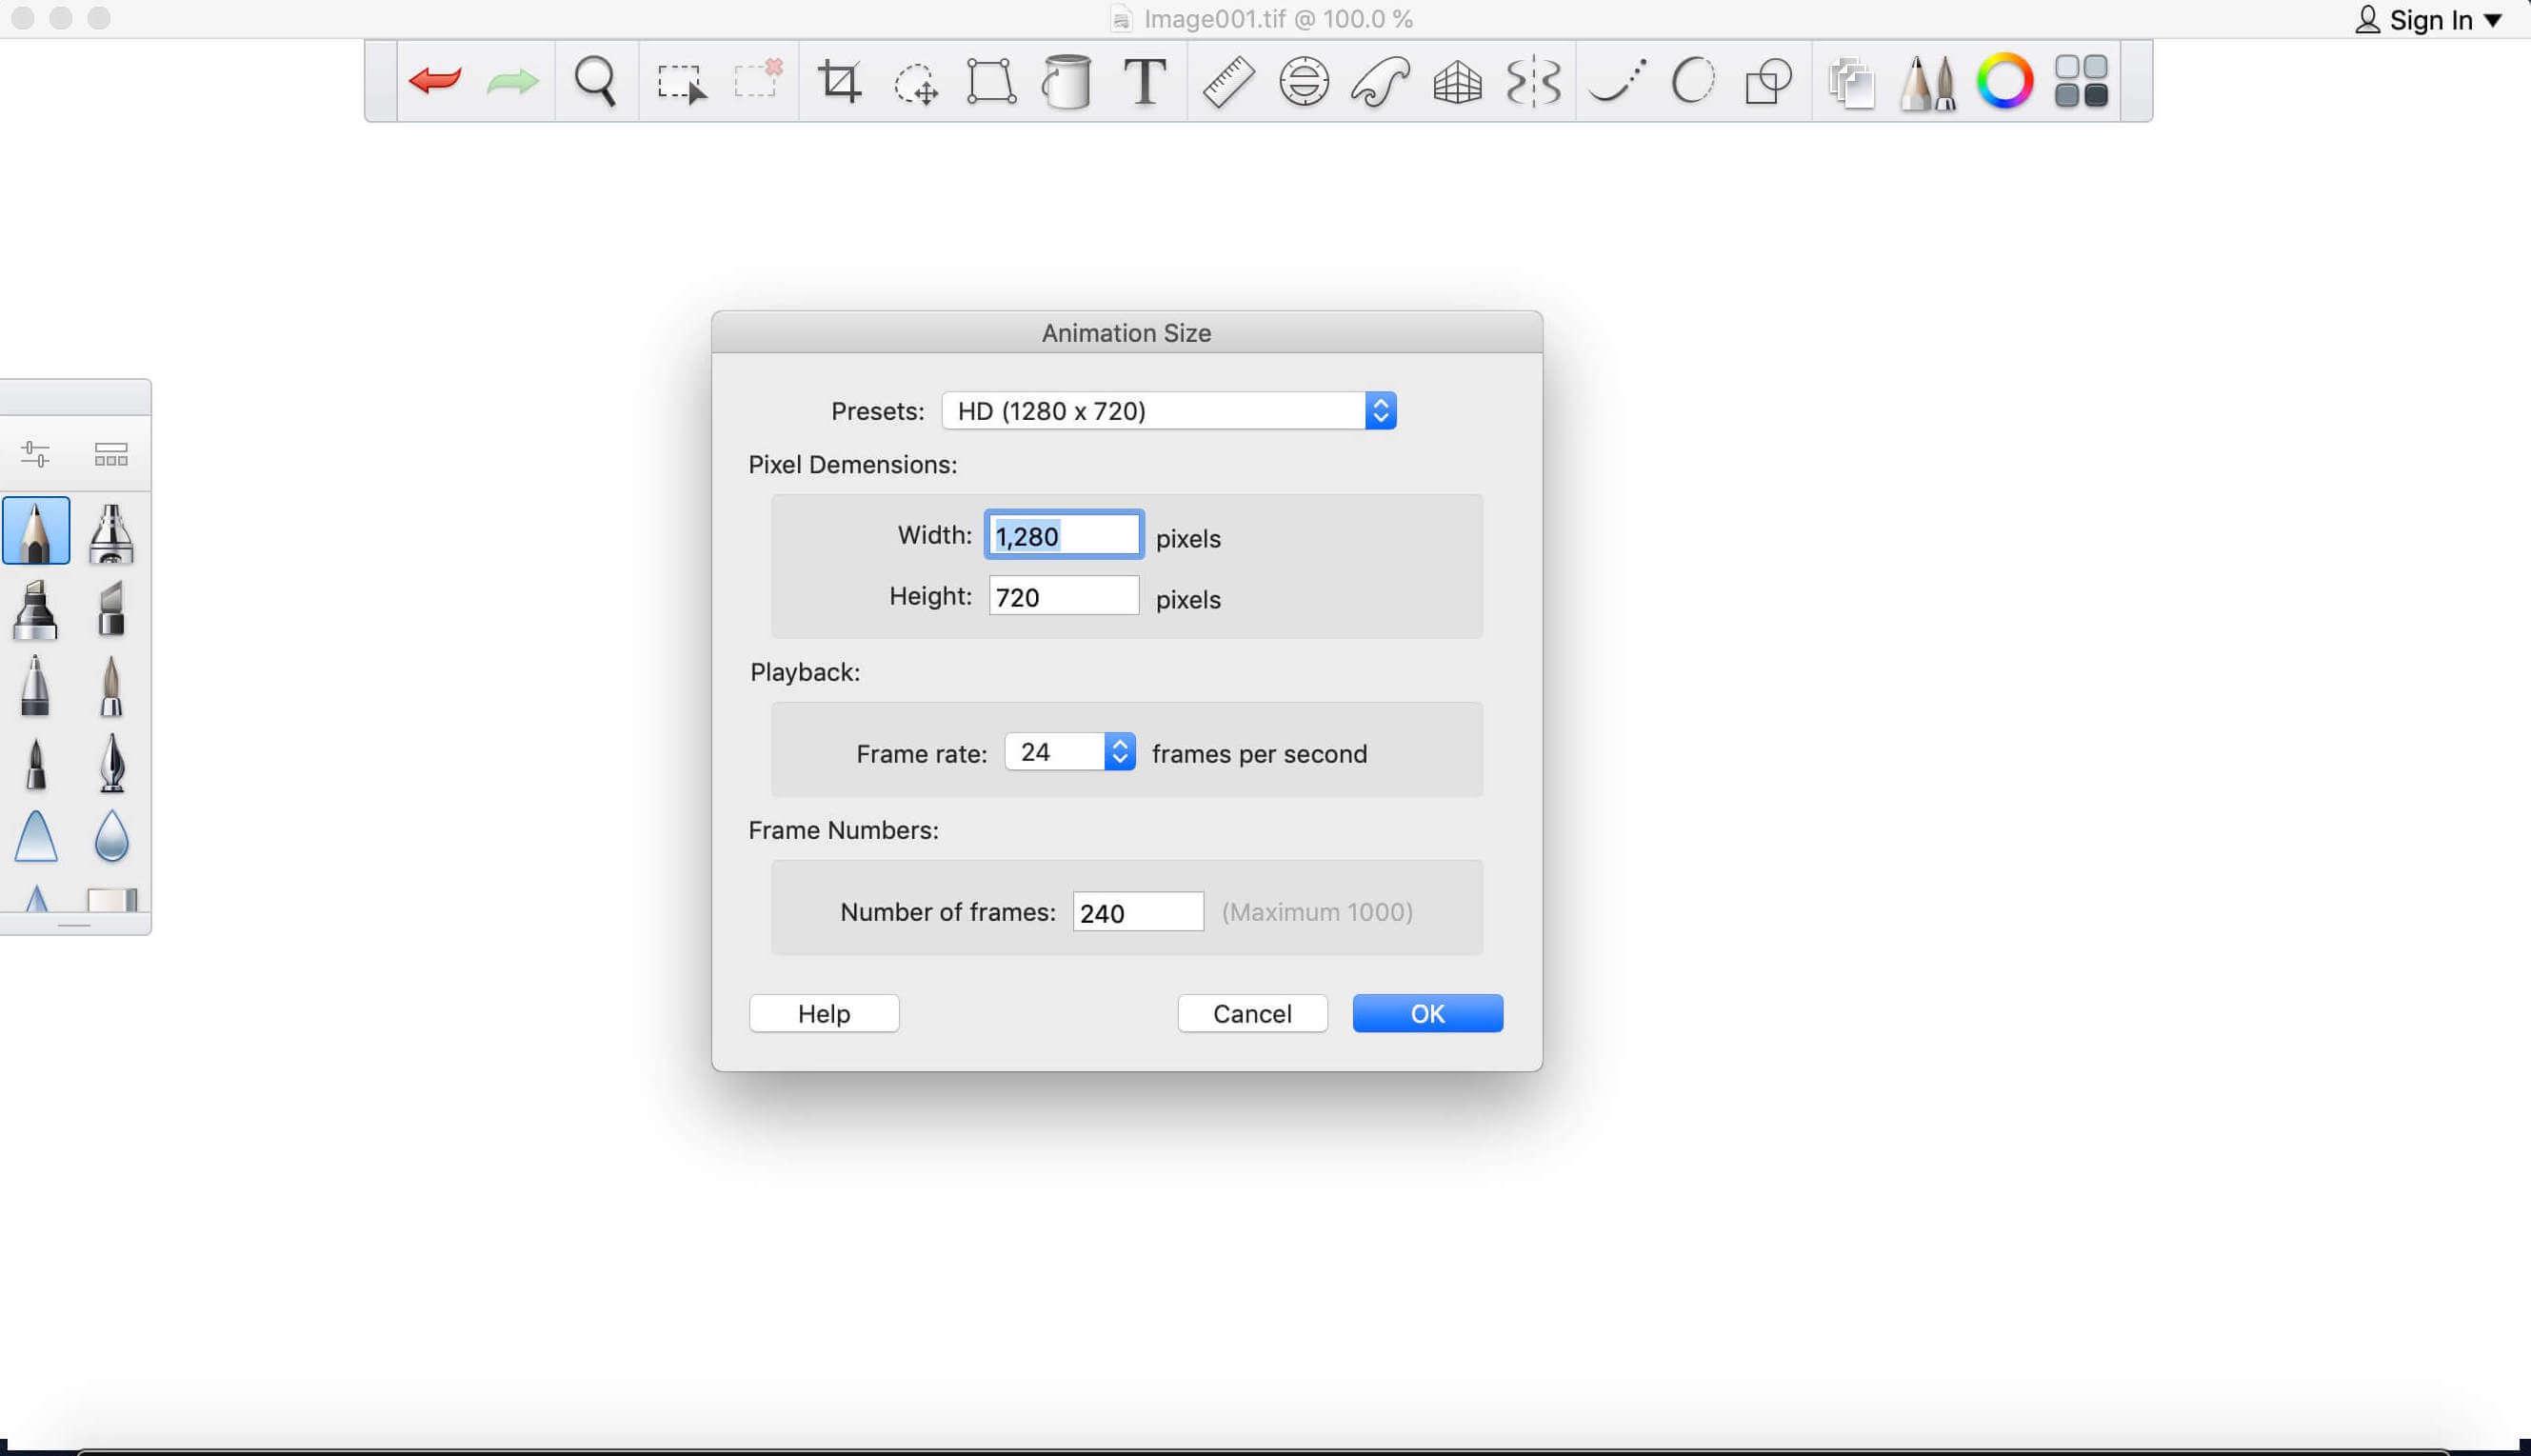 Autodesk Sketchbook Pro 7 For Mac - polaristune's diary